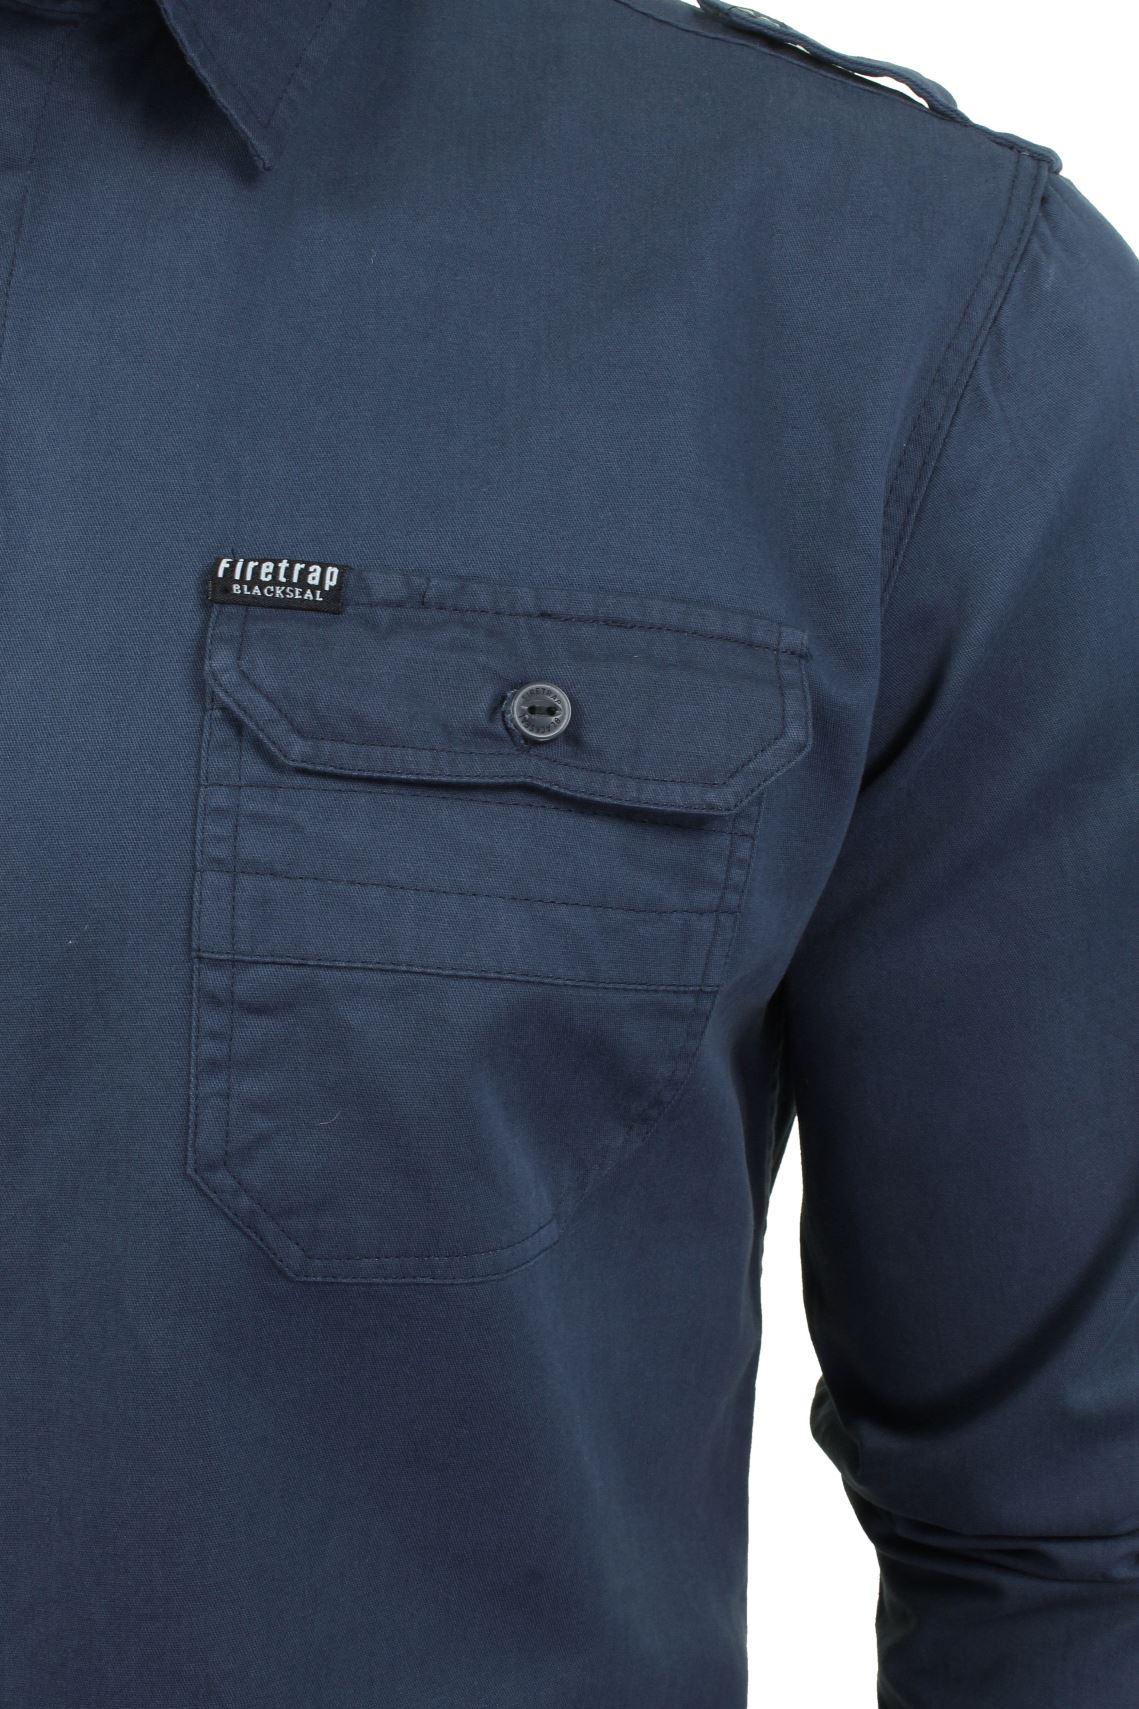 Camisa-para-hombre-por-Firetrap-039-Pittson-039-Manga-Larga miniatura 19